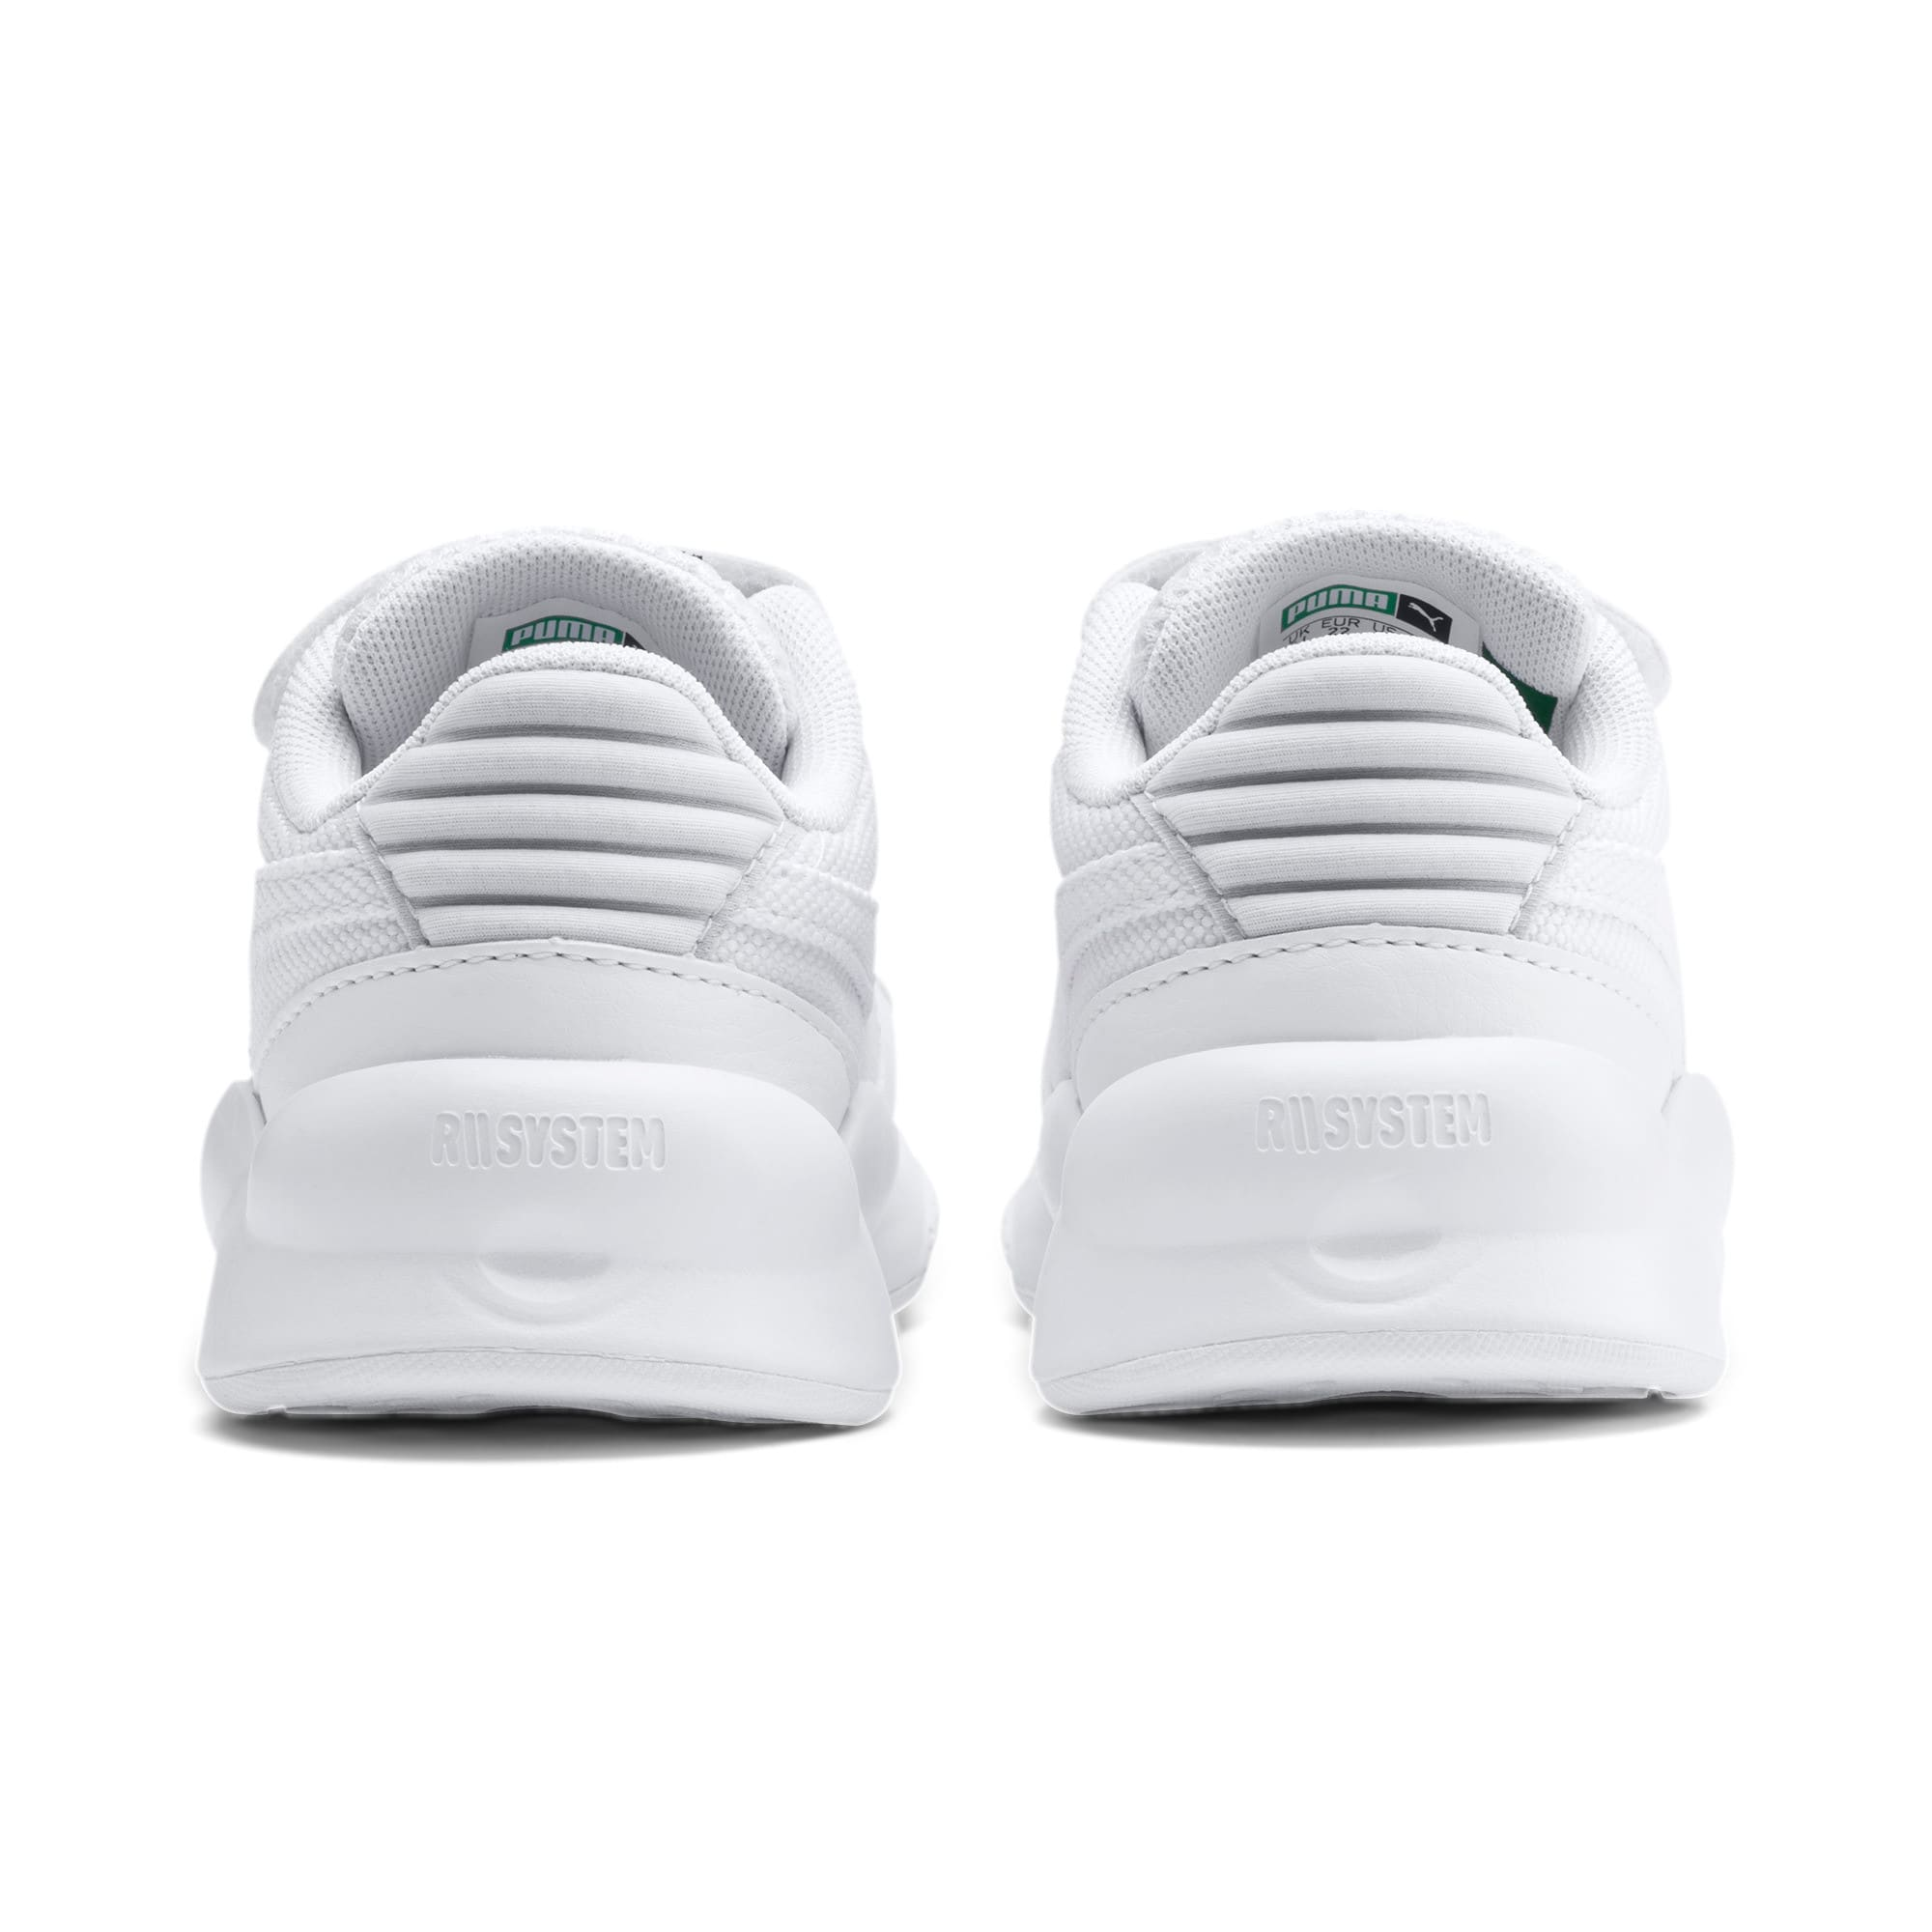 Thumbnail 3 of RS 9.8 Core Toddler Shoes, Puma White, medium